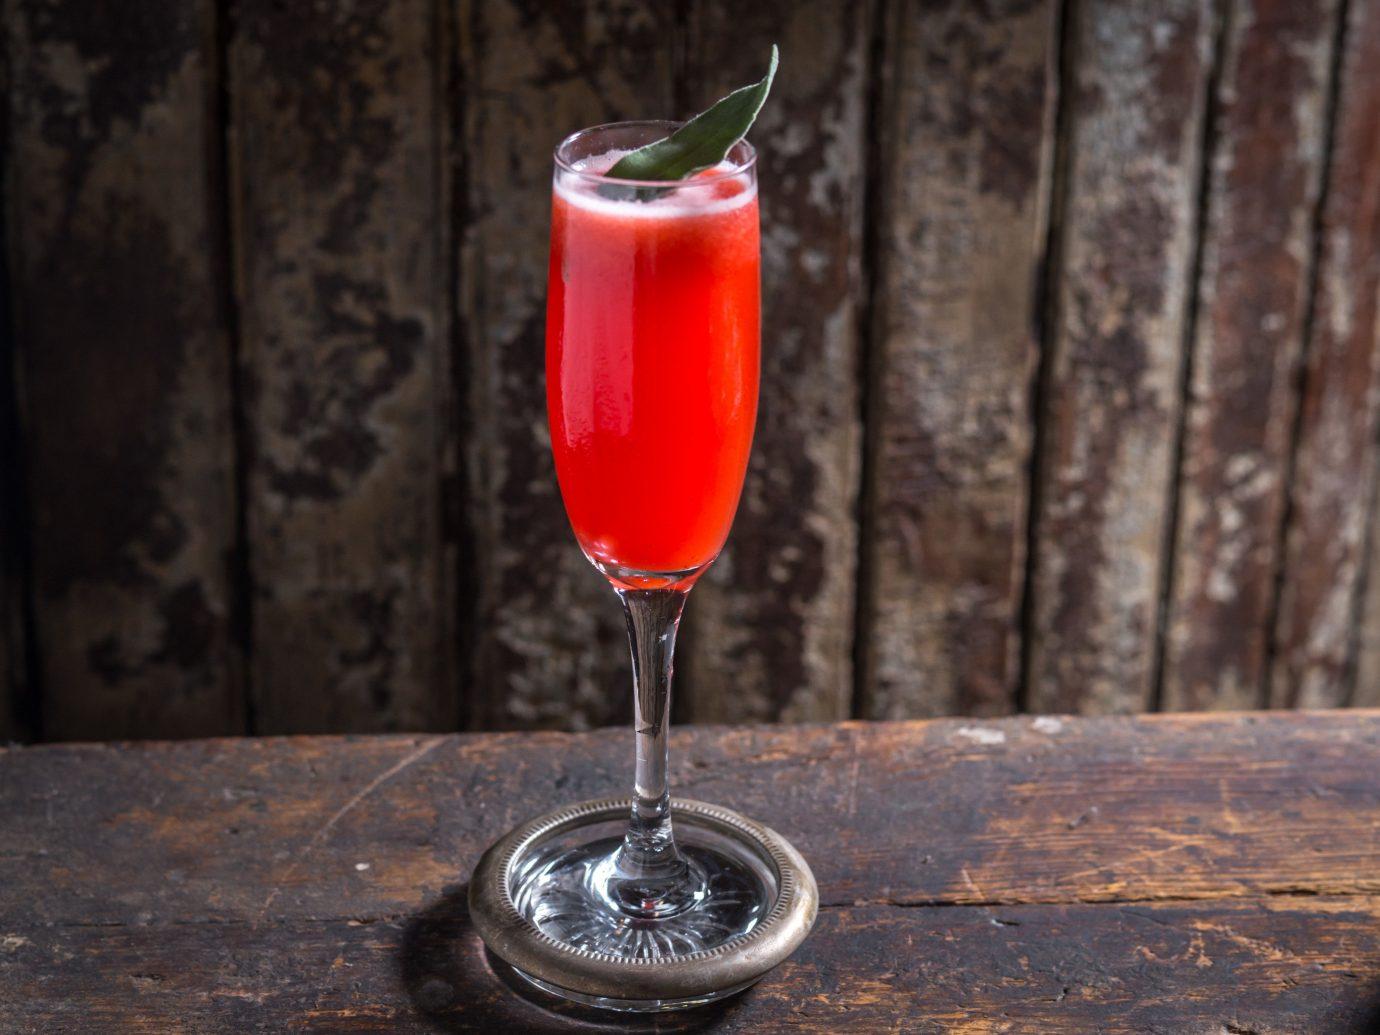 Food + Drink Romance table wine Drink alcoholic beverage cocktail beverage wooden produce distilled beverage glass alcohol fruit drink